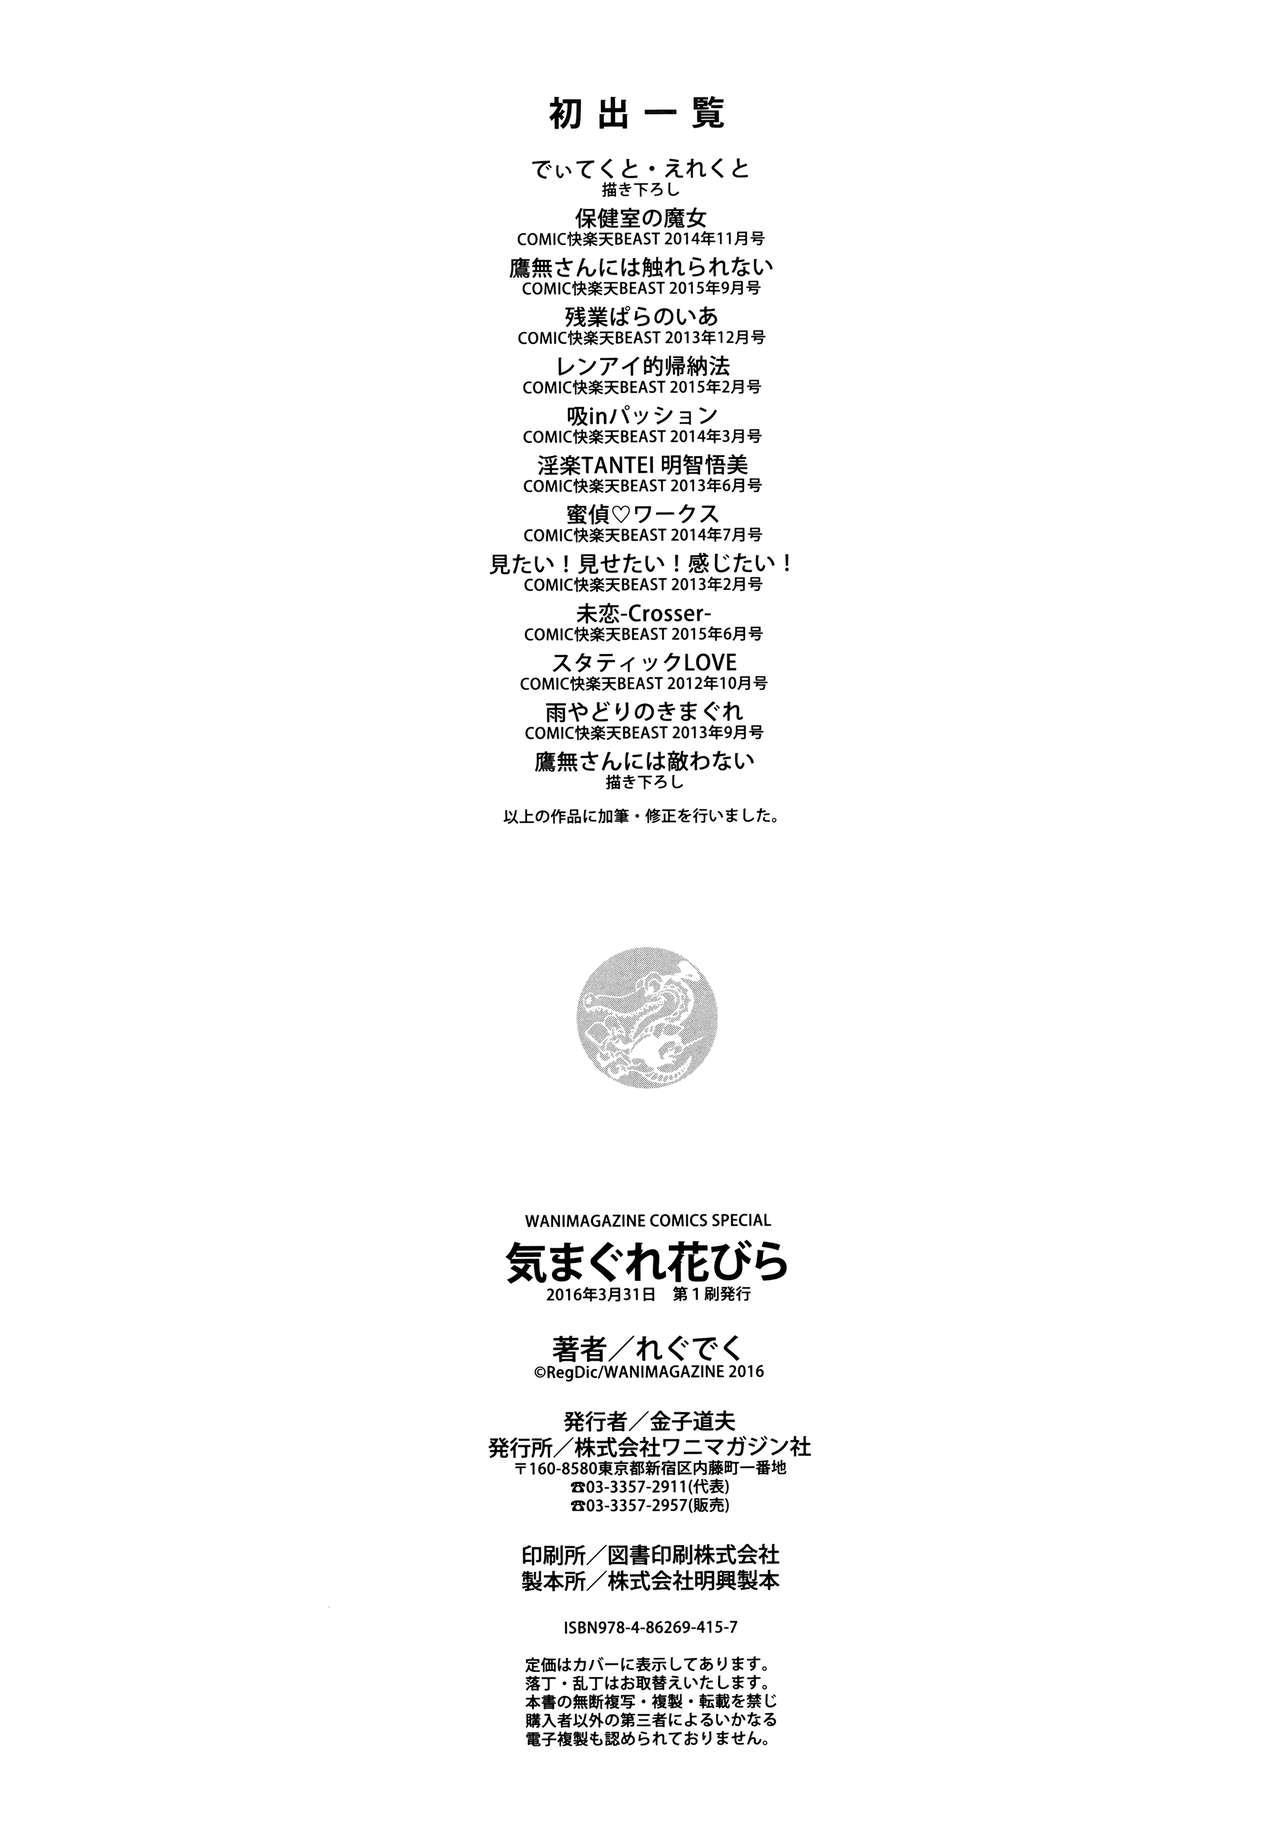 Kimagure Hanabira + Toranoana Leaflet 218